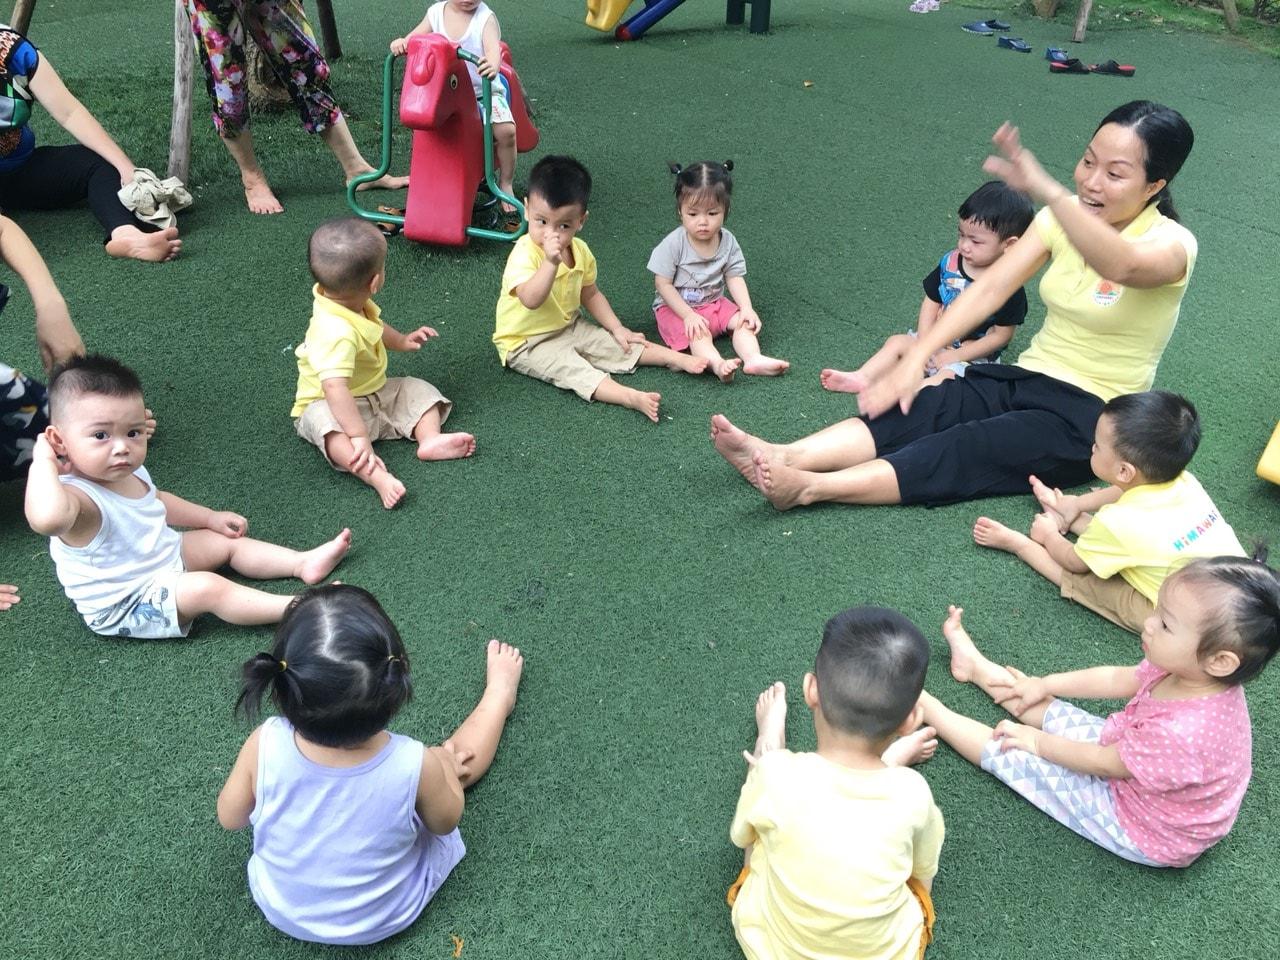 Trường mầm non Himawari (Himawari Kindergarten) Cơ sở 2 - Minh Khai